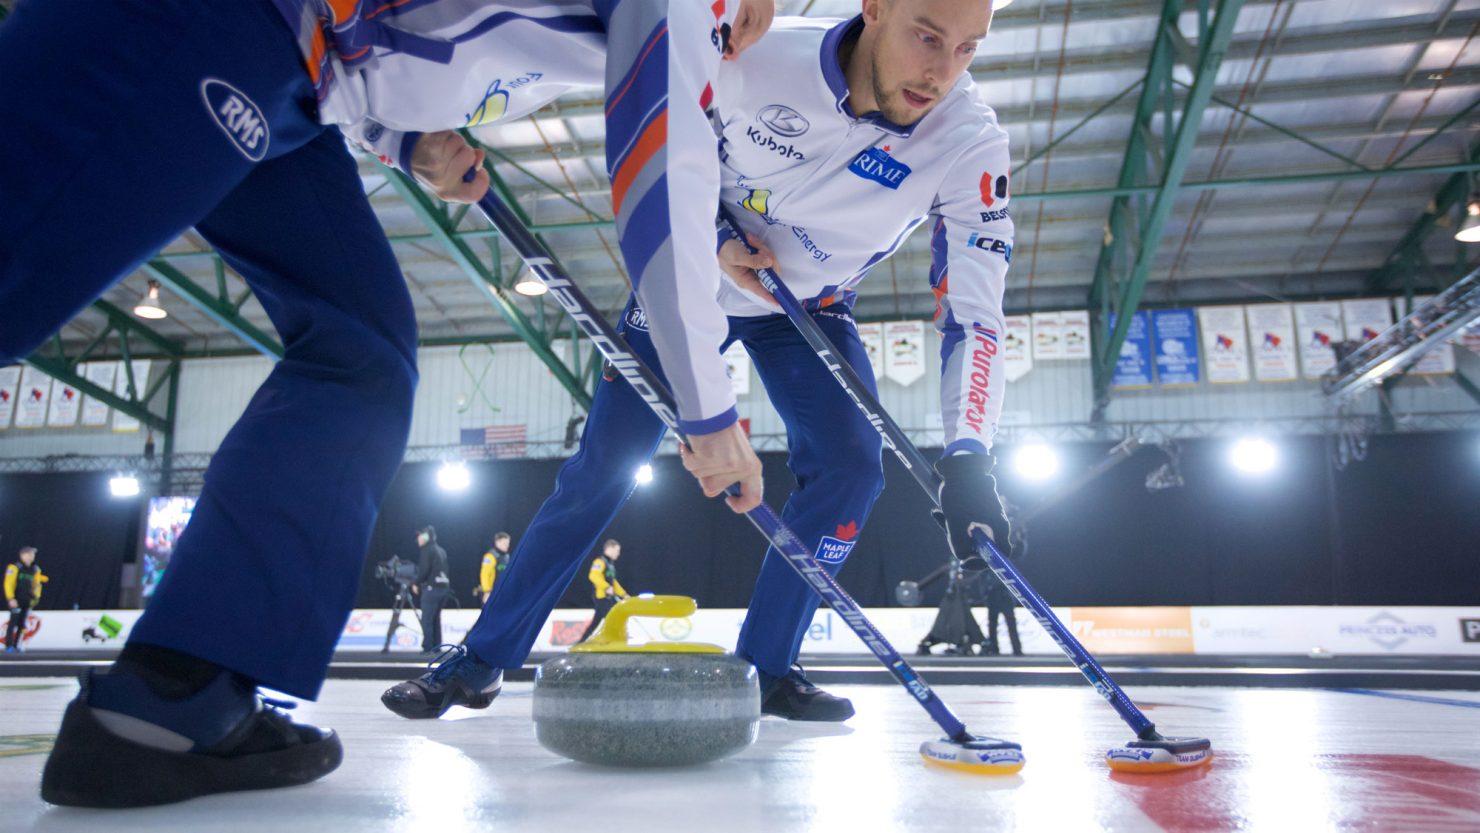 2015–16 curling season